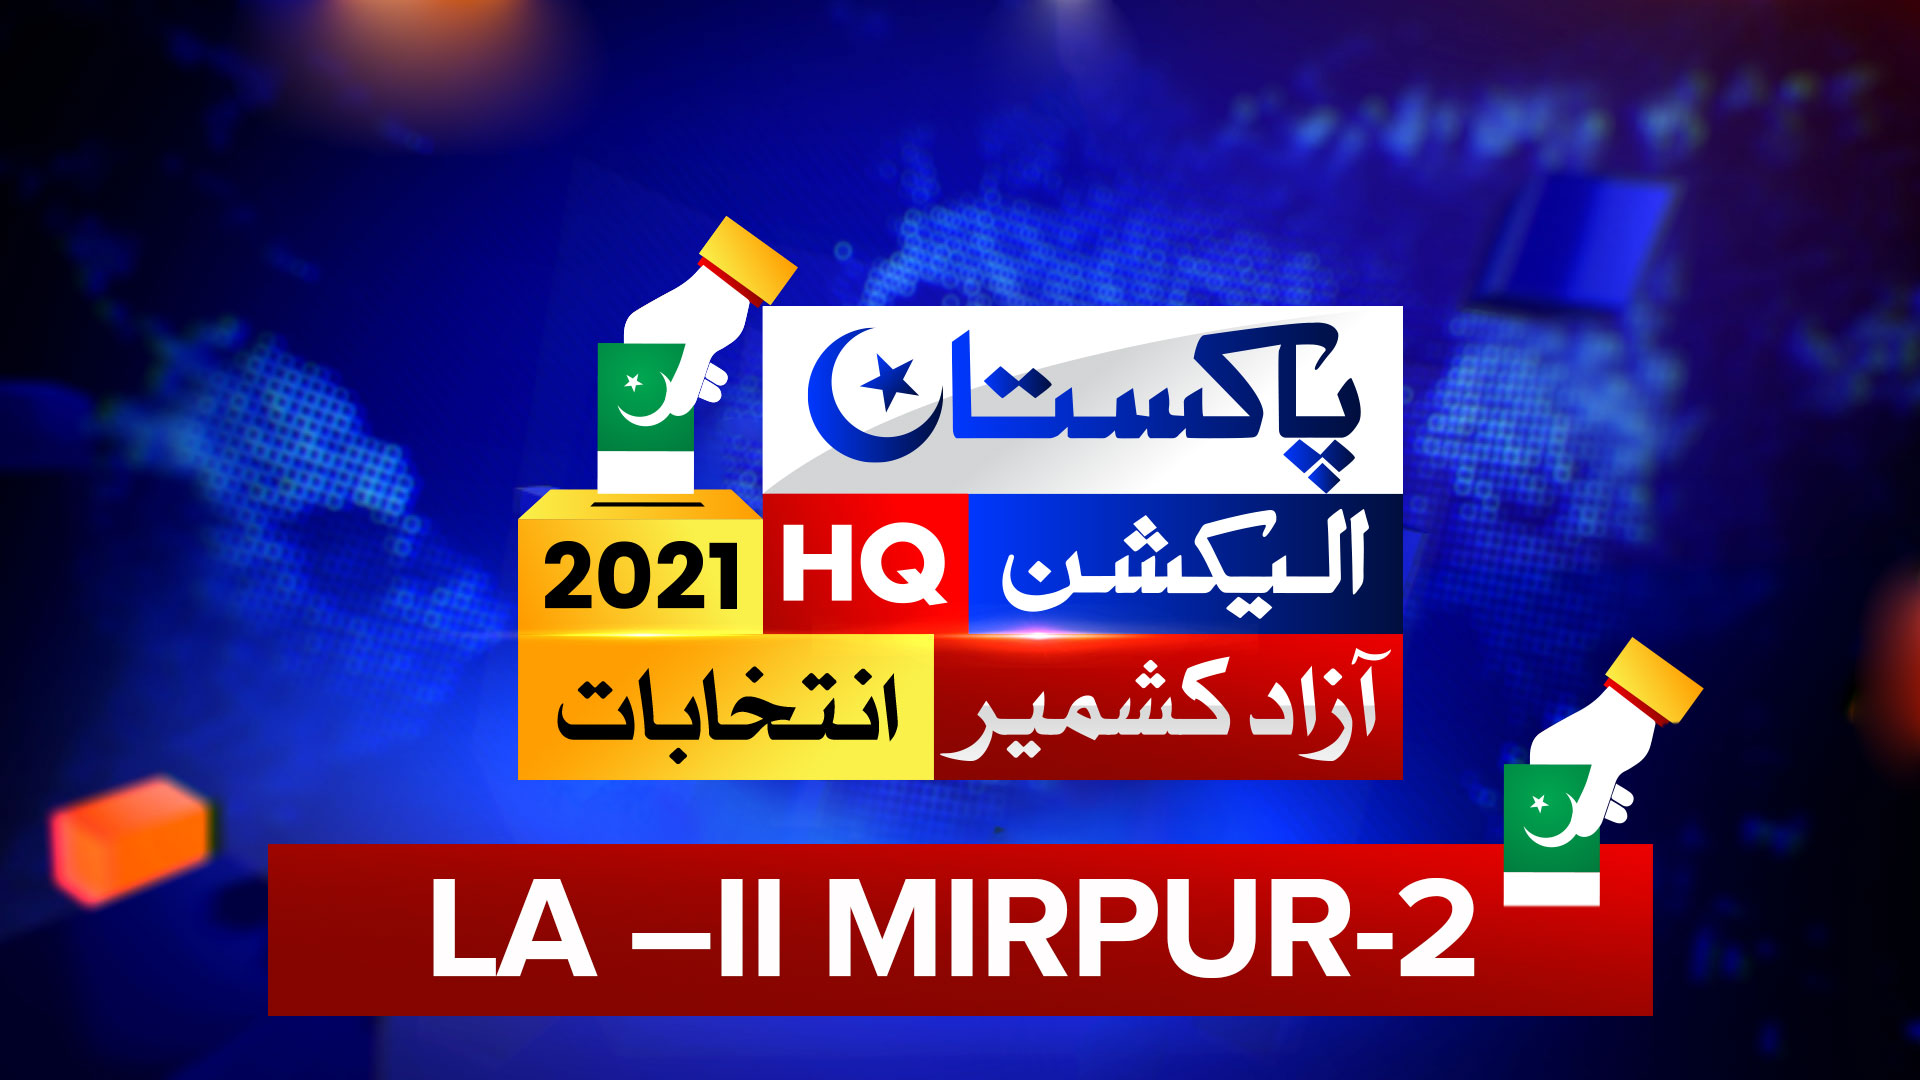 LA 2 MIRPUR 2 AJK Election Results 2021